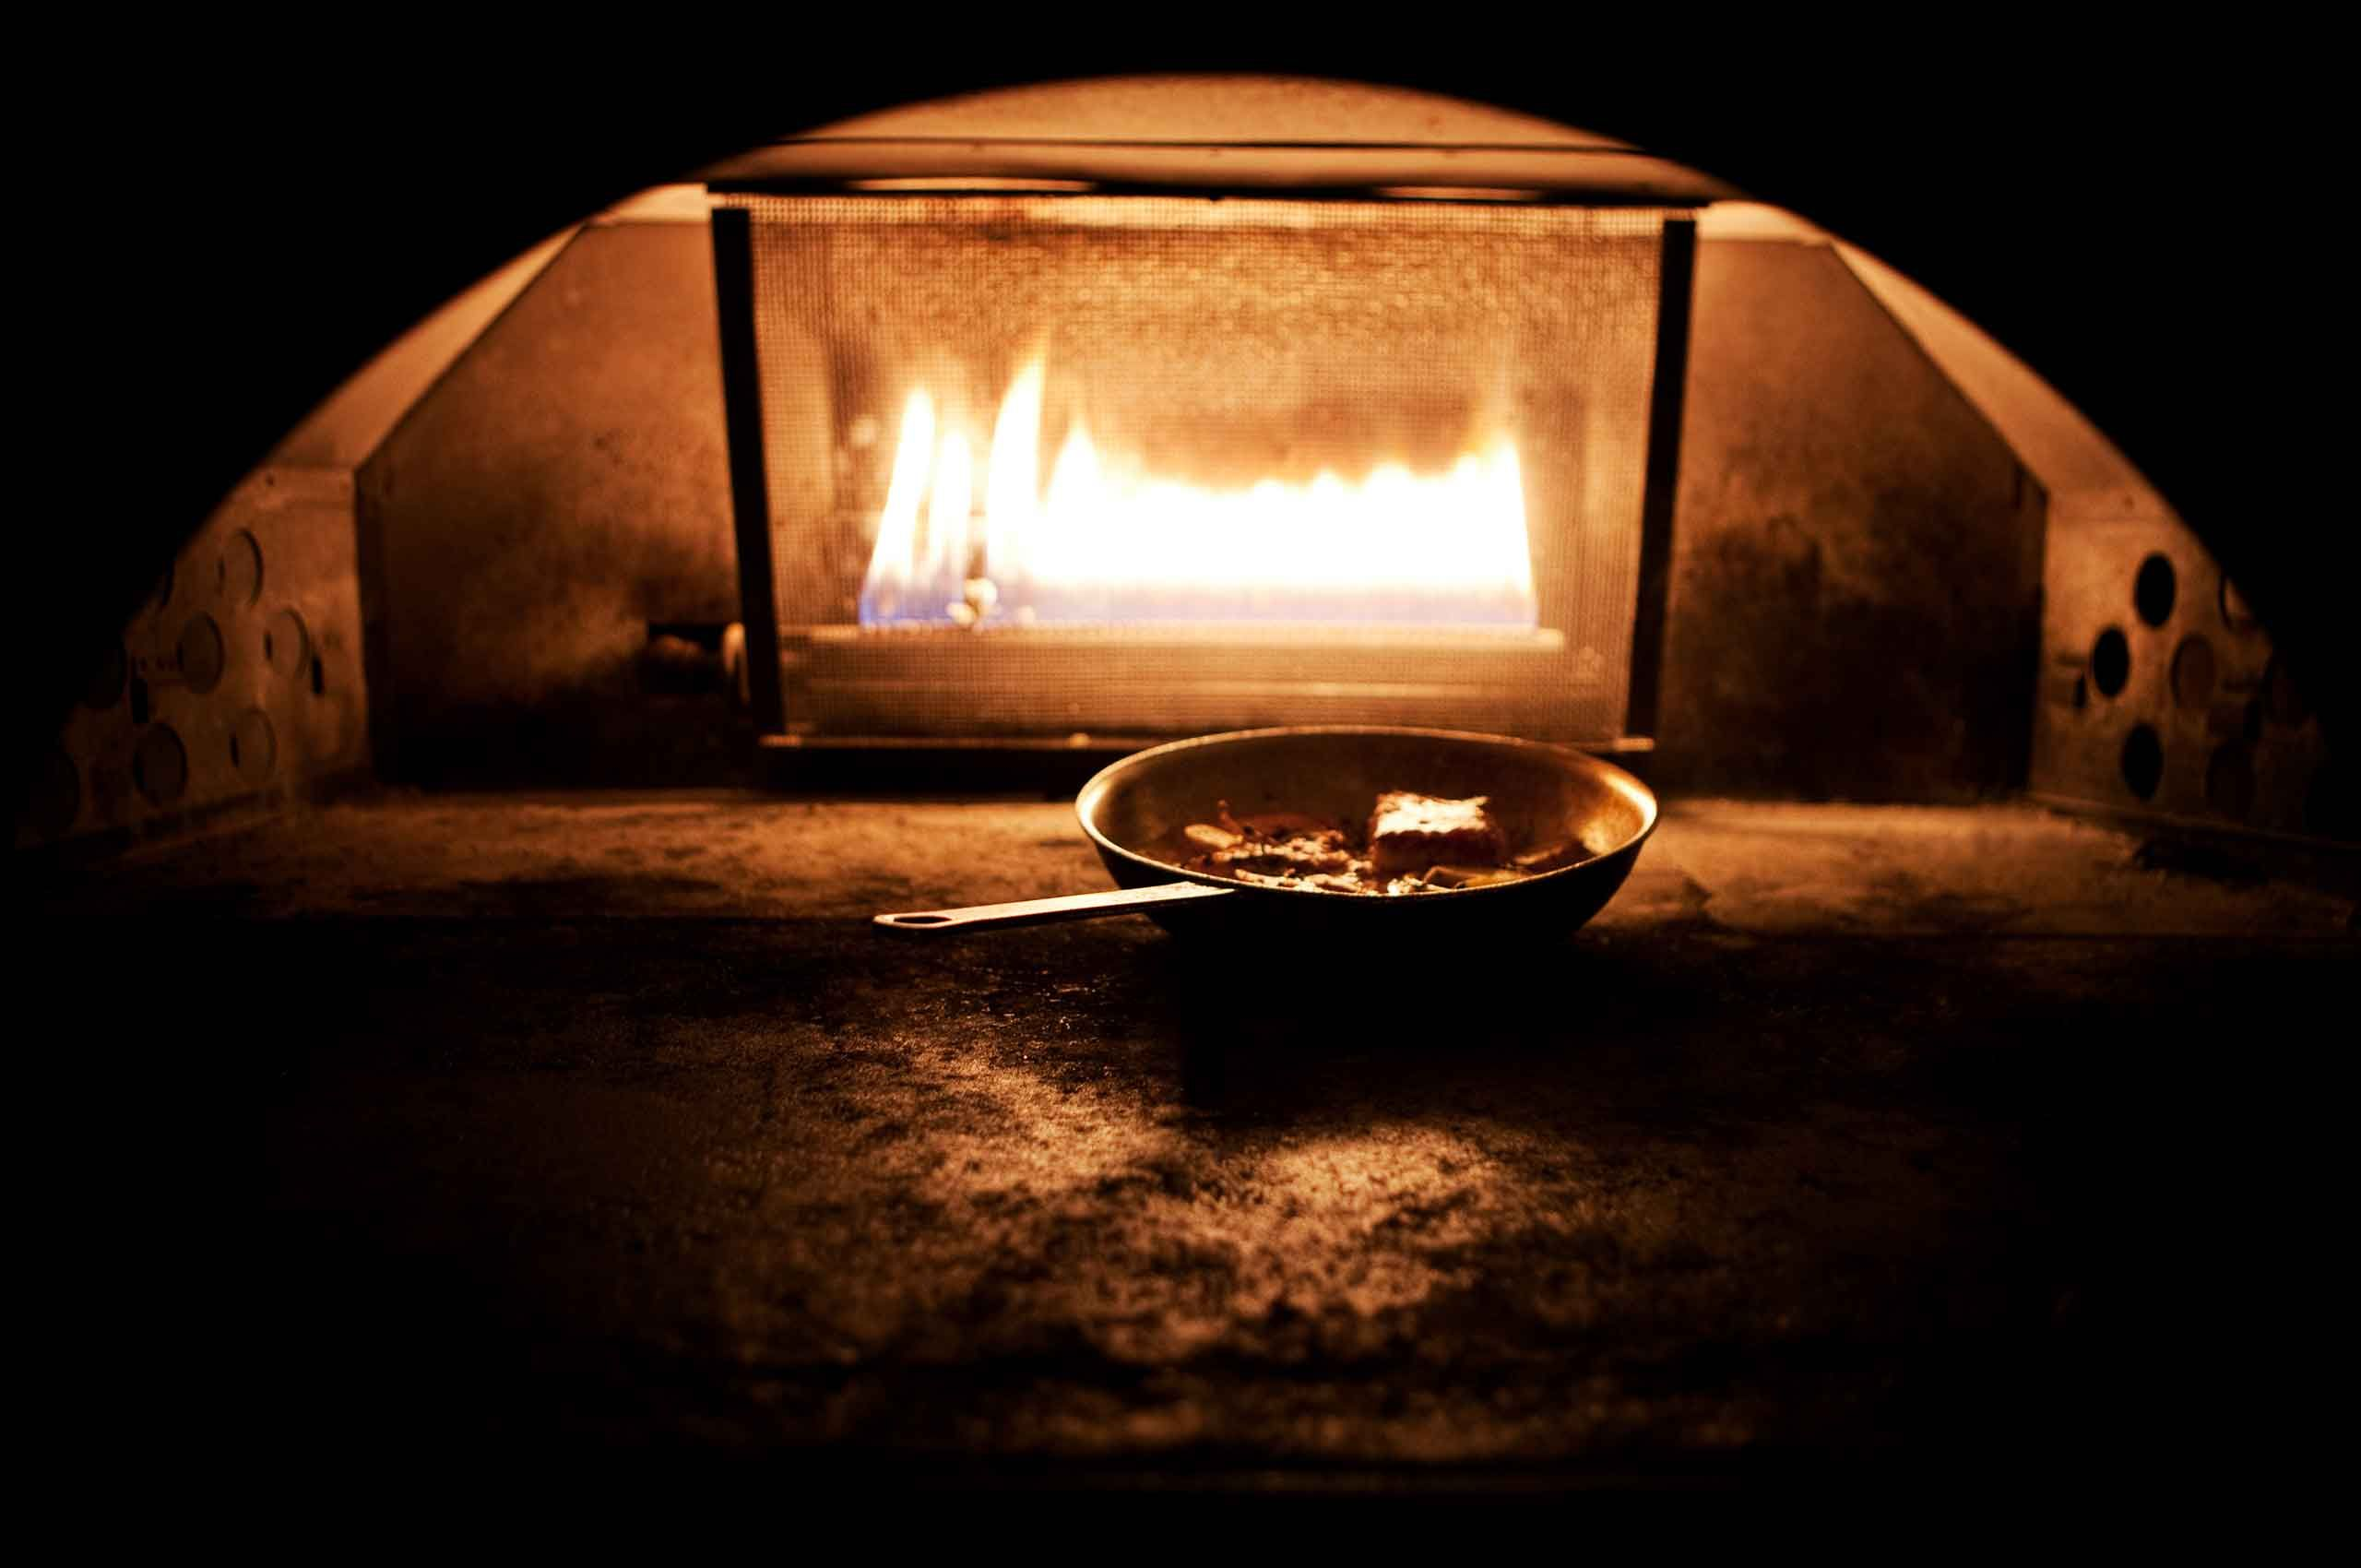 Coalfired-Oven-with-pan-by-HenrikOlundPhotography.jpg